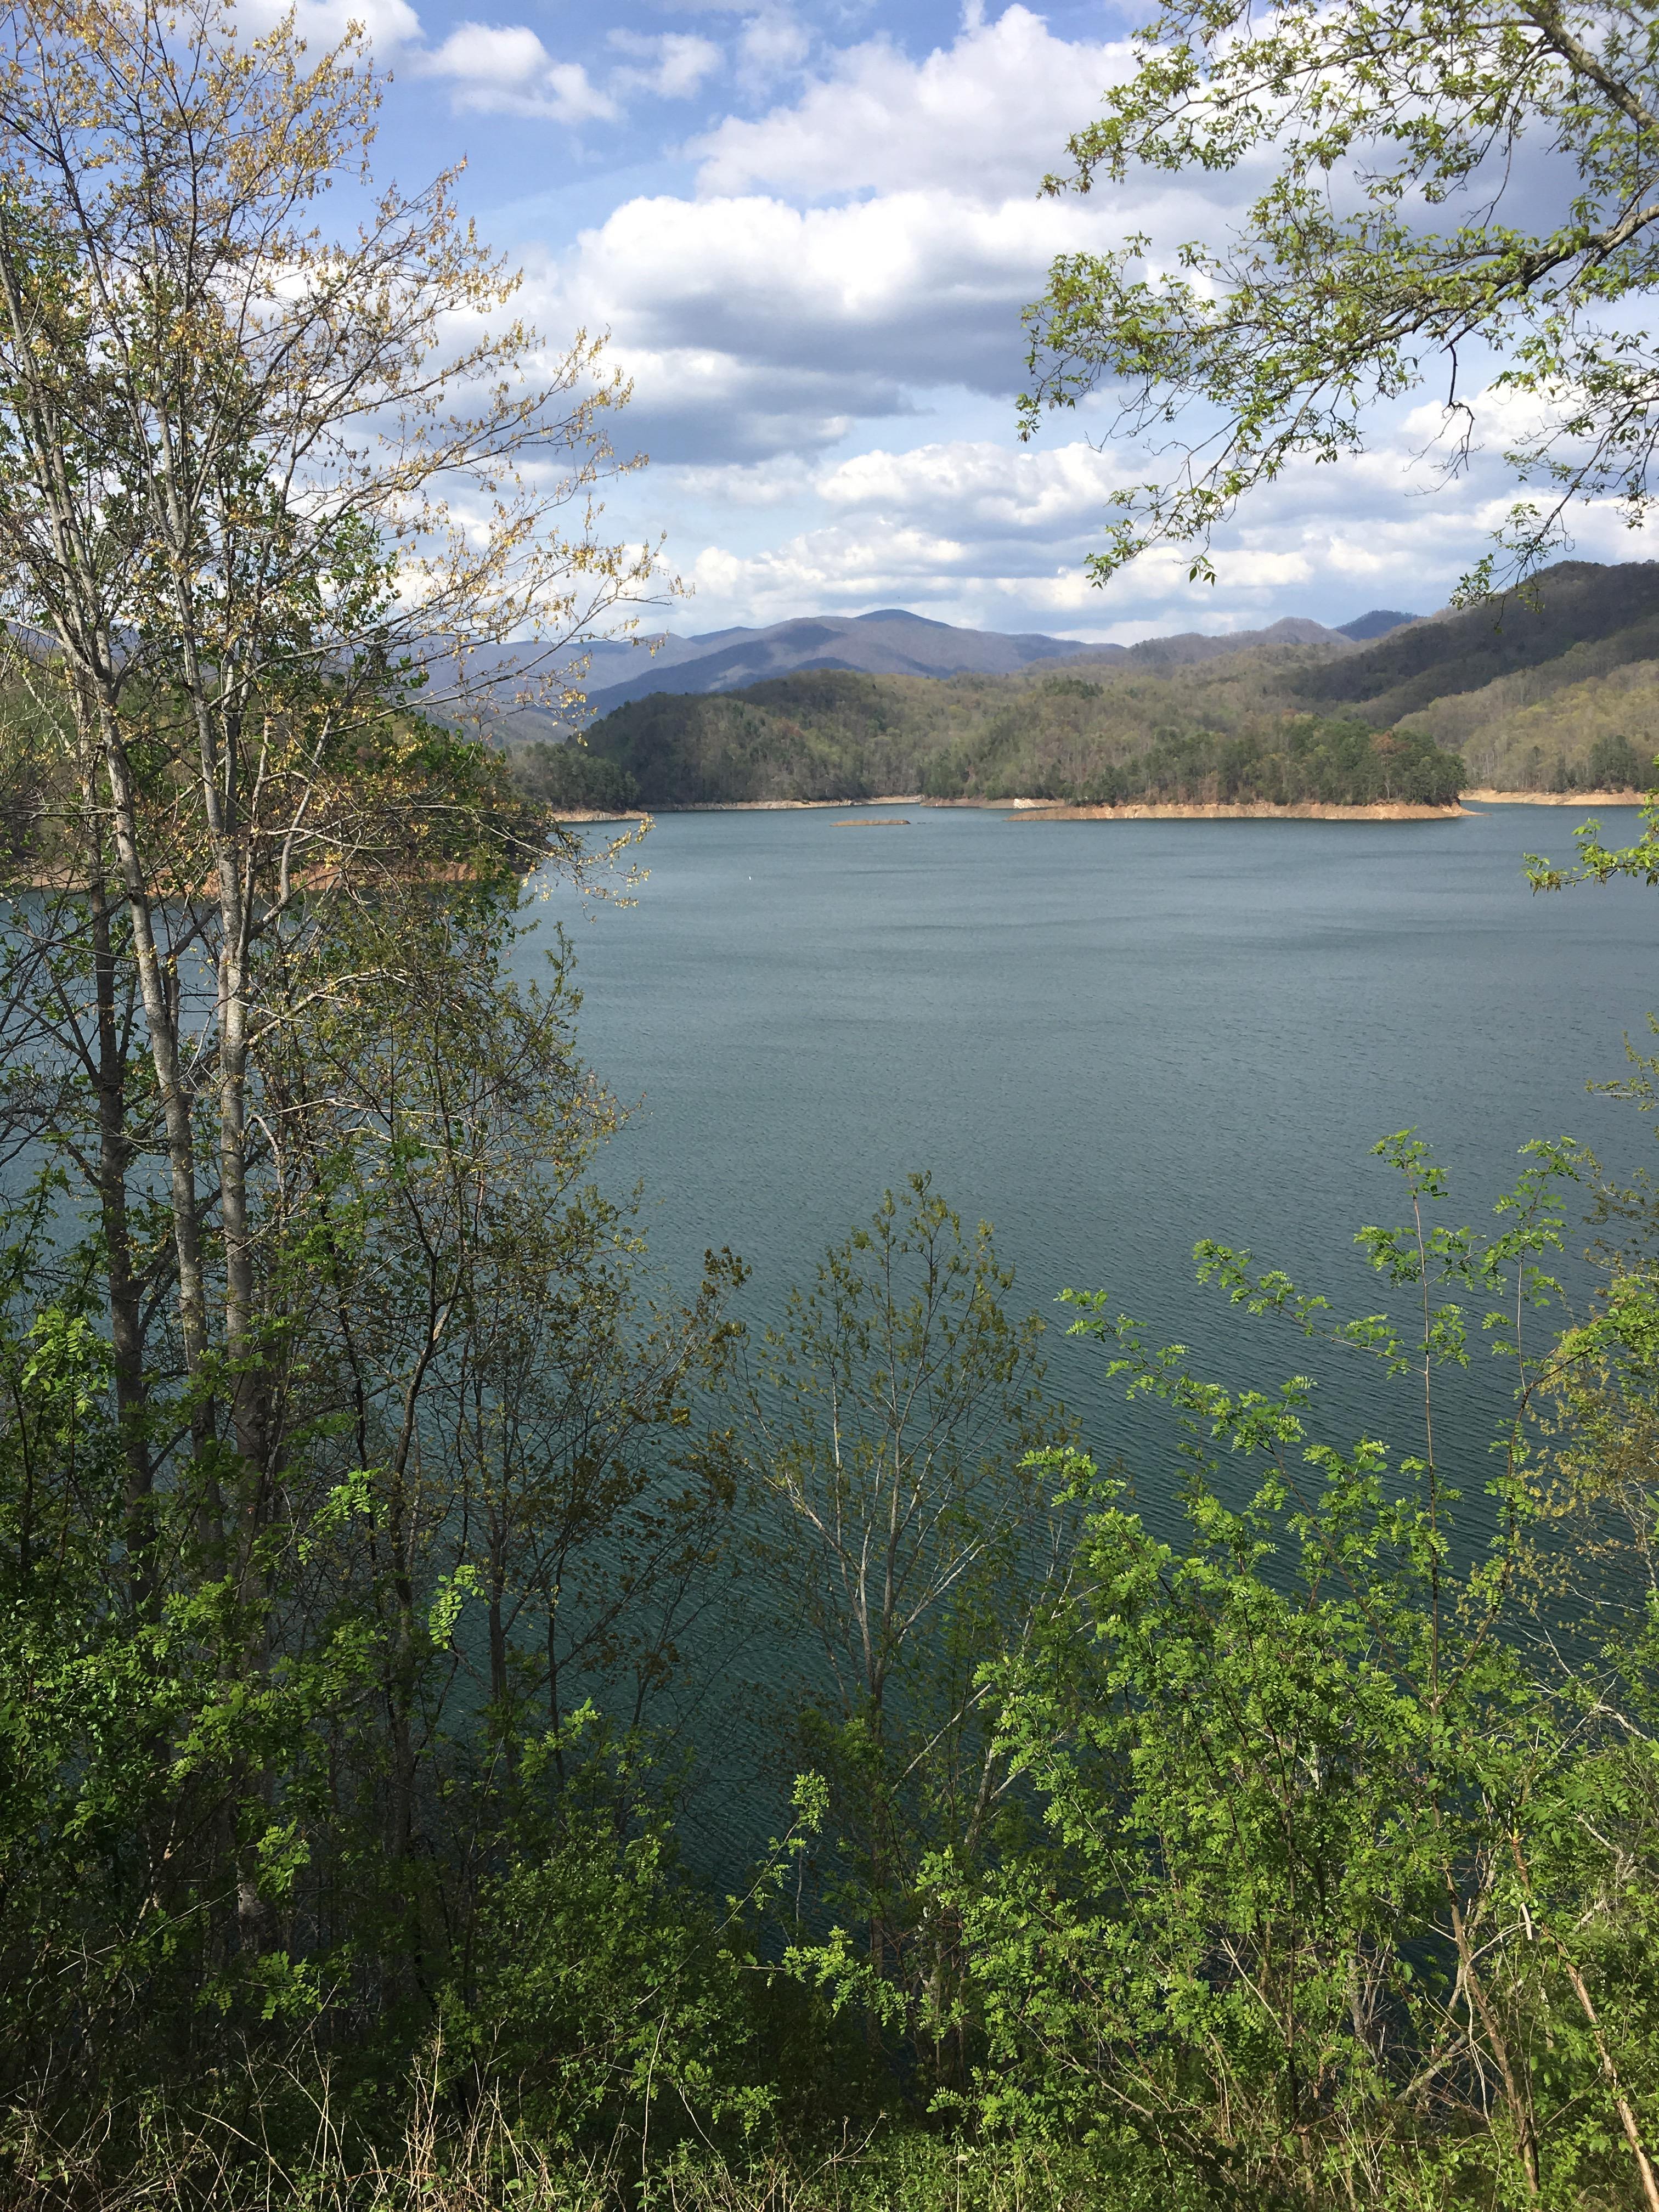 The Barefoot Hiker Survives Franklin, the NOC, Fontana Dam - The Trek